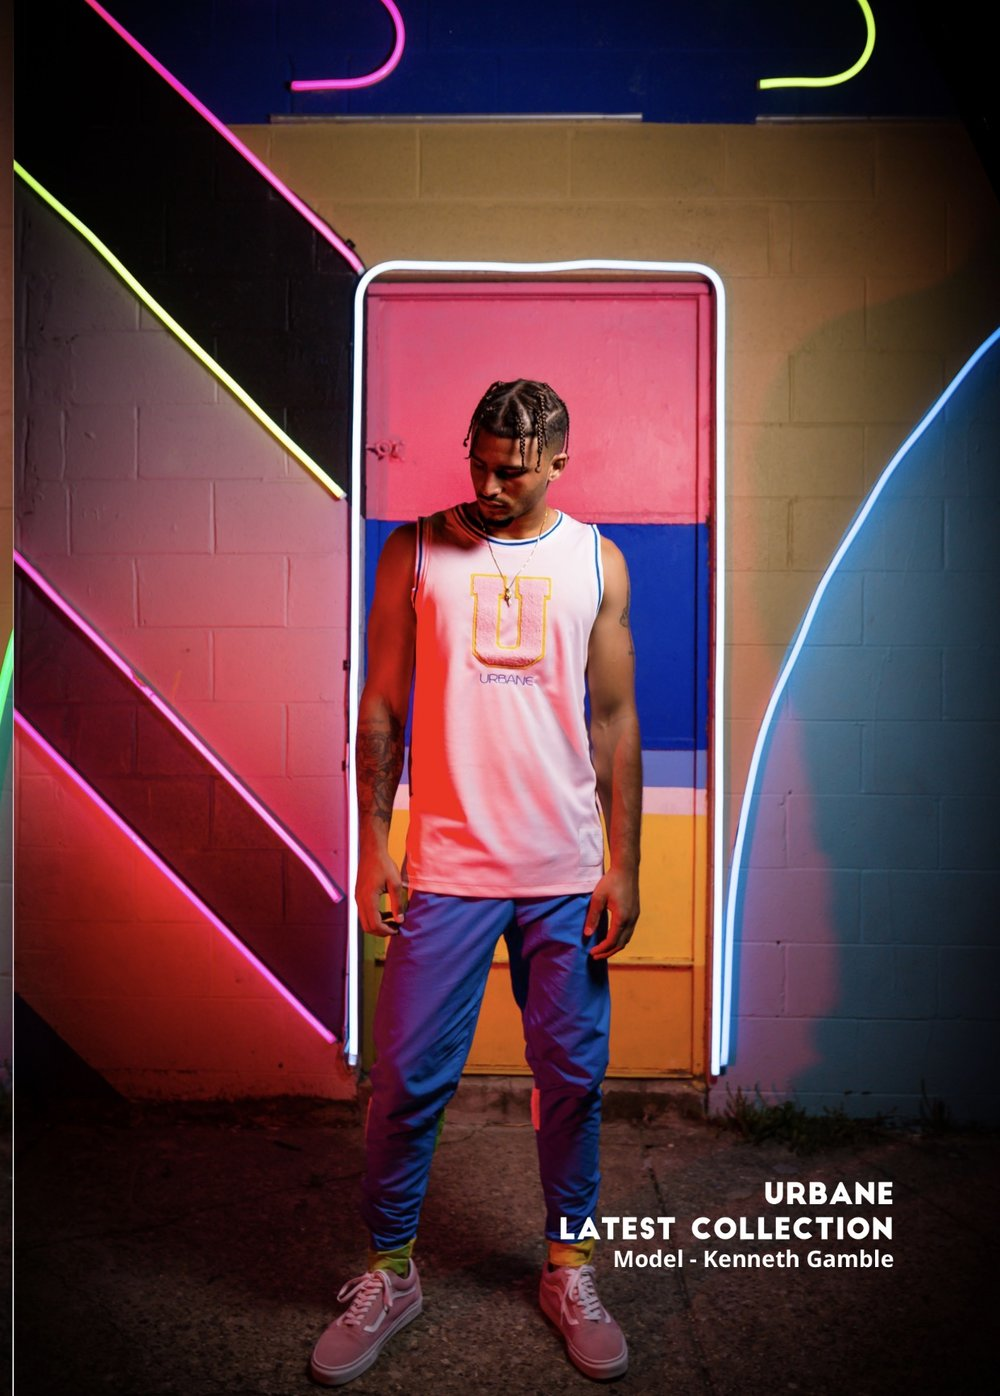 High Voltage Fashion Magazine Summer Issue Feature - HVF Magazine Features URBANE SS17